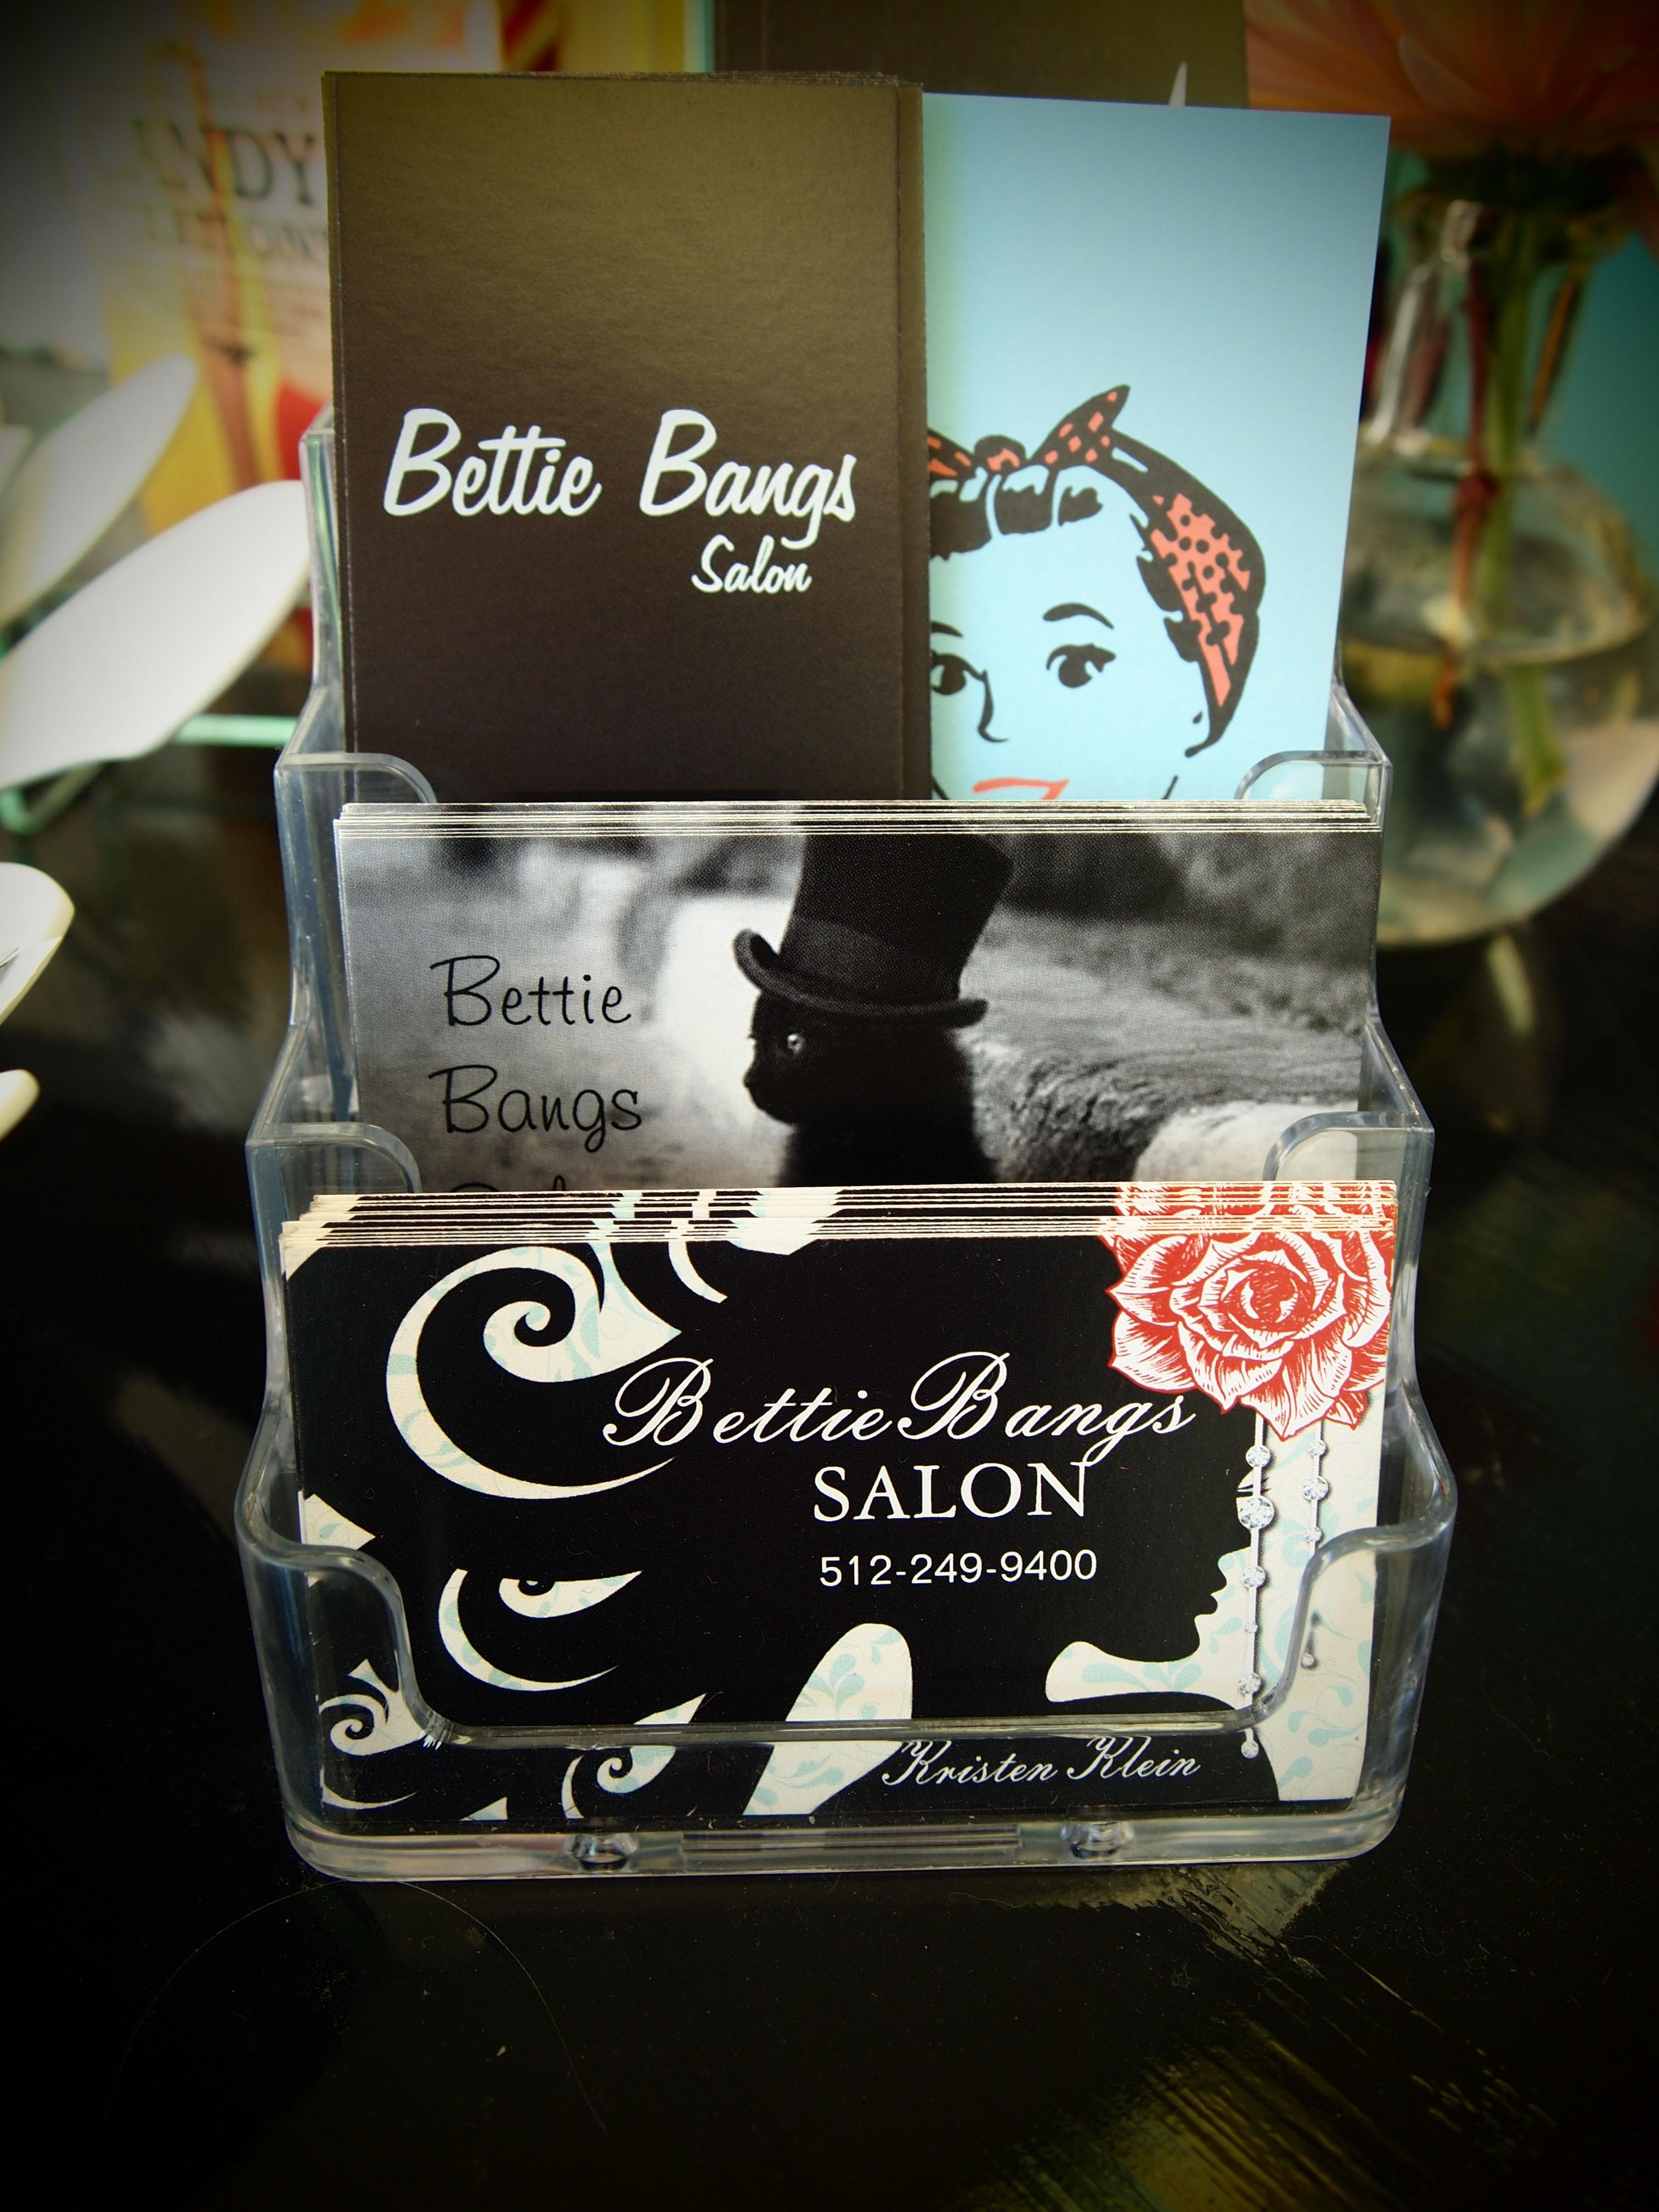 Bettie Bangs Salon image 44